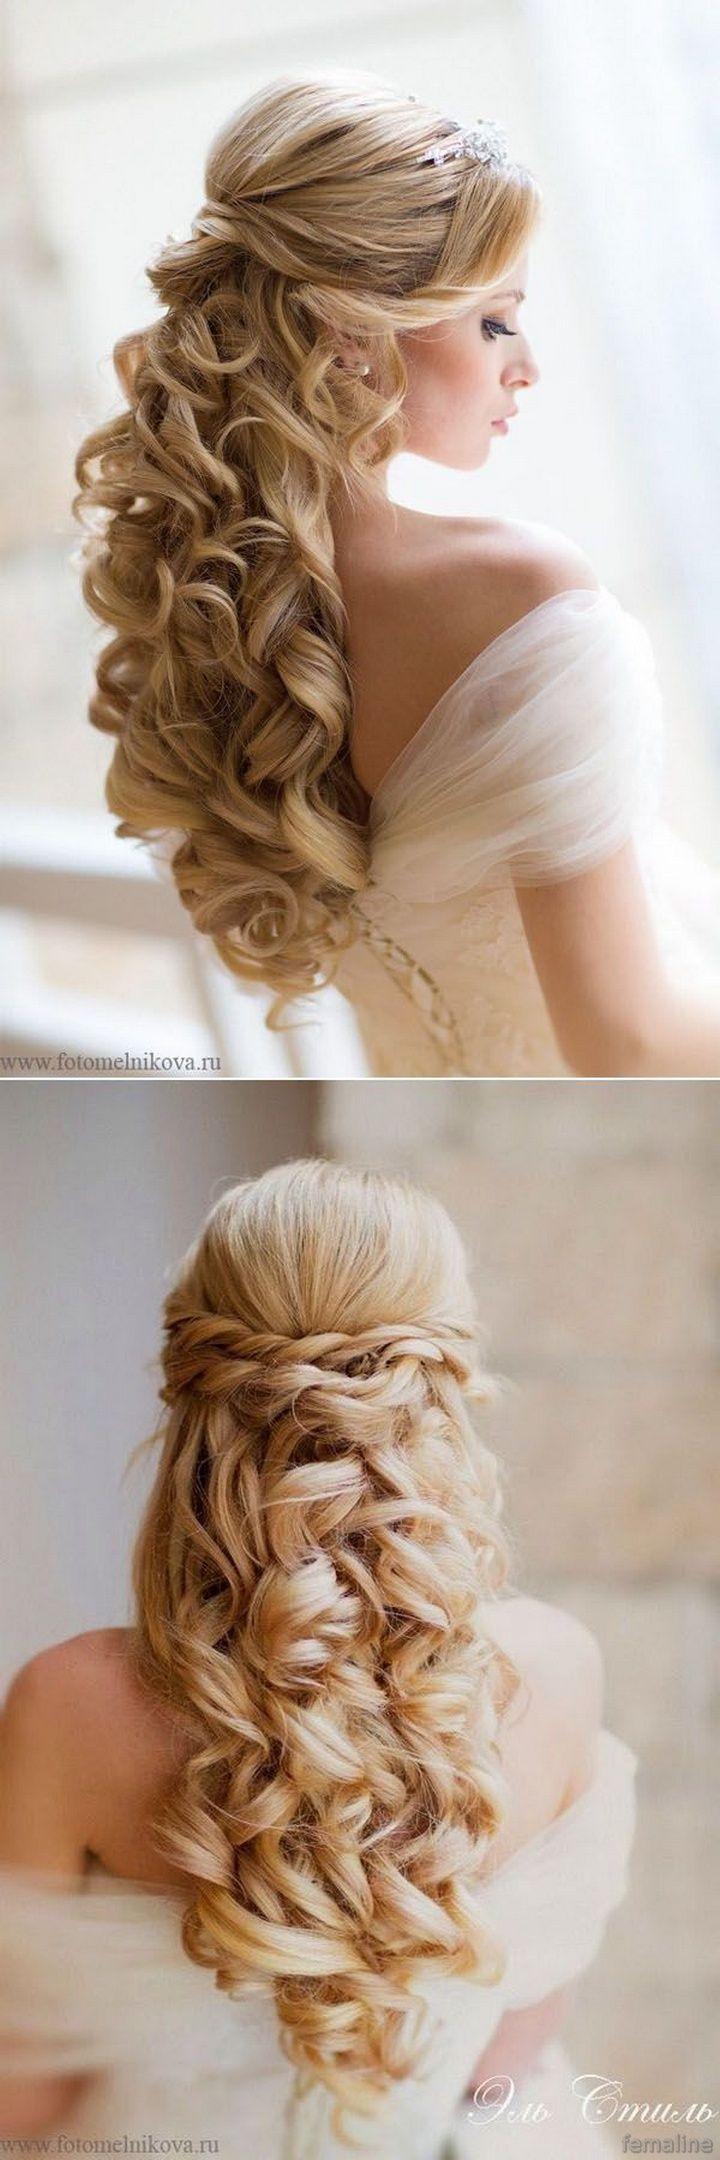 best 25+ strapless dress hairstyles ideas on pinterest | updos